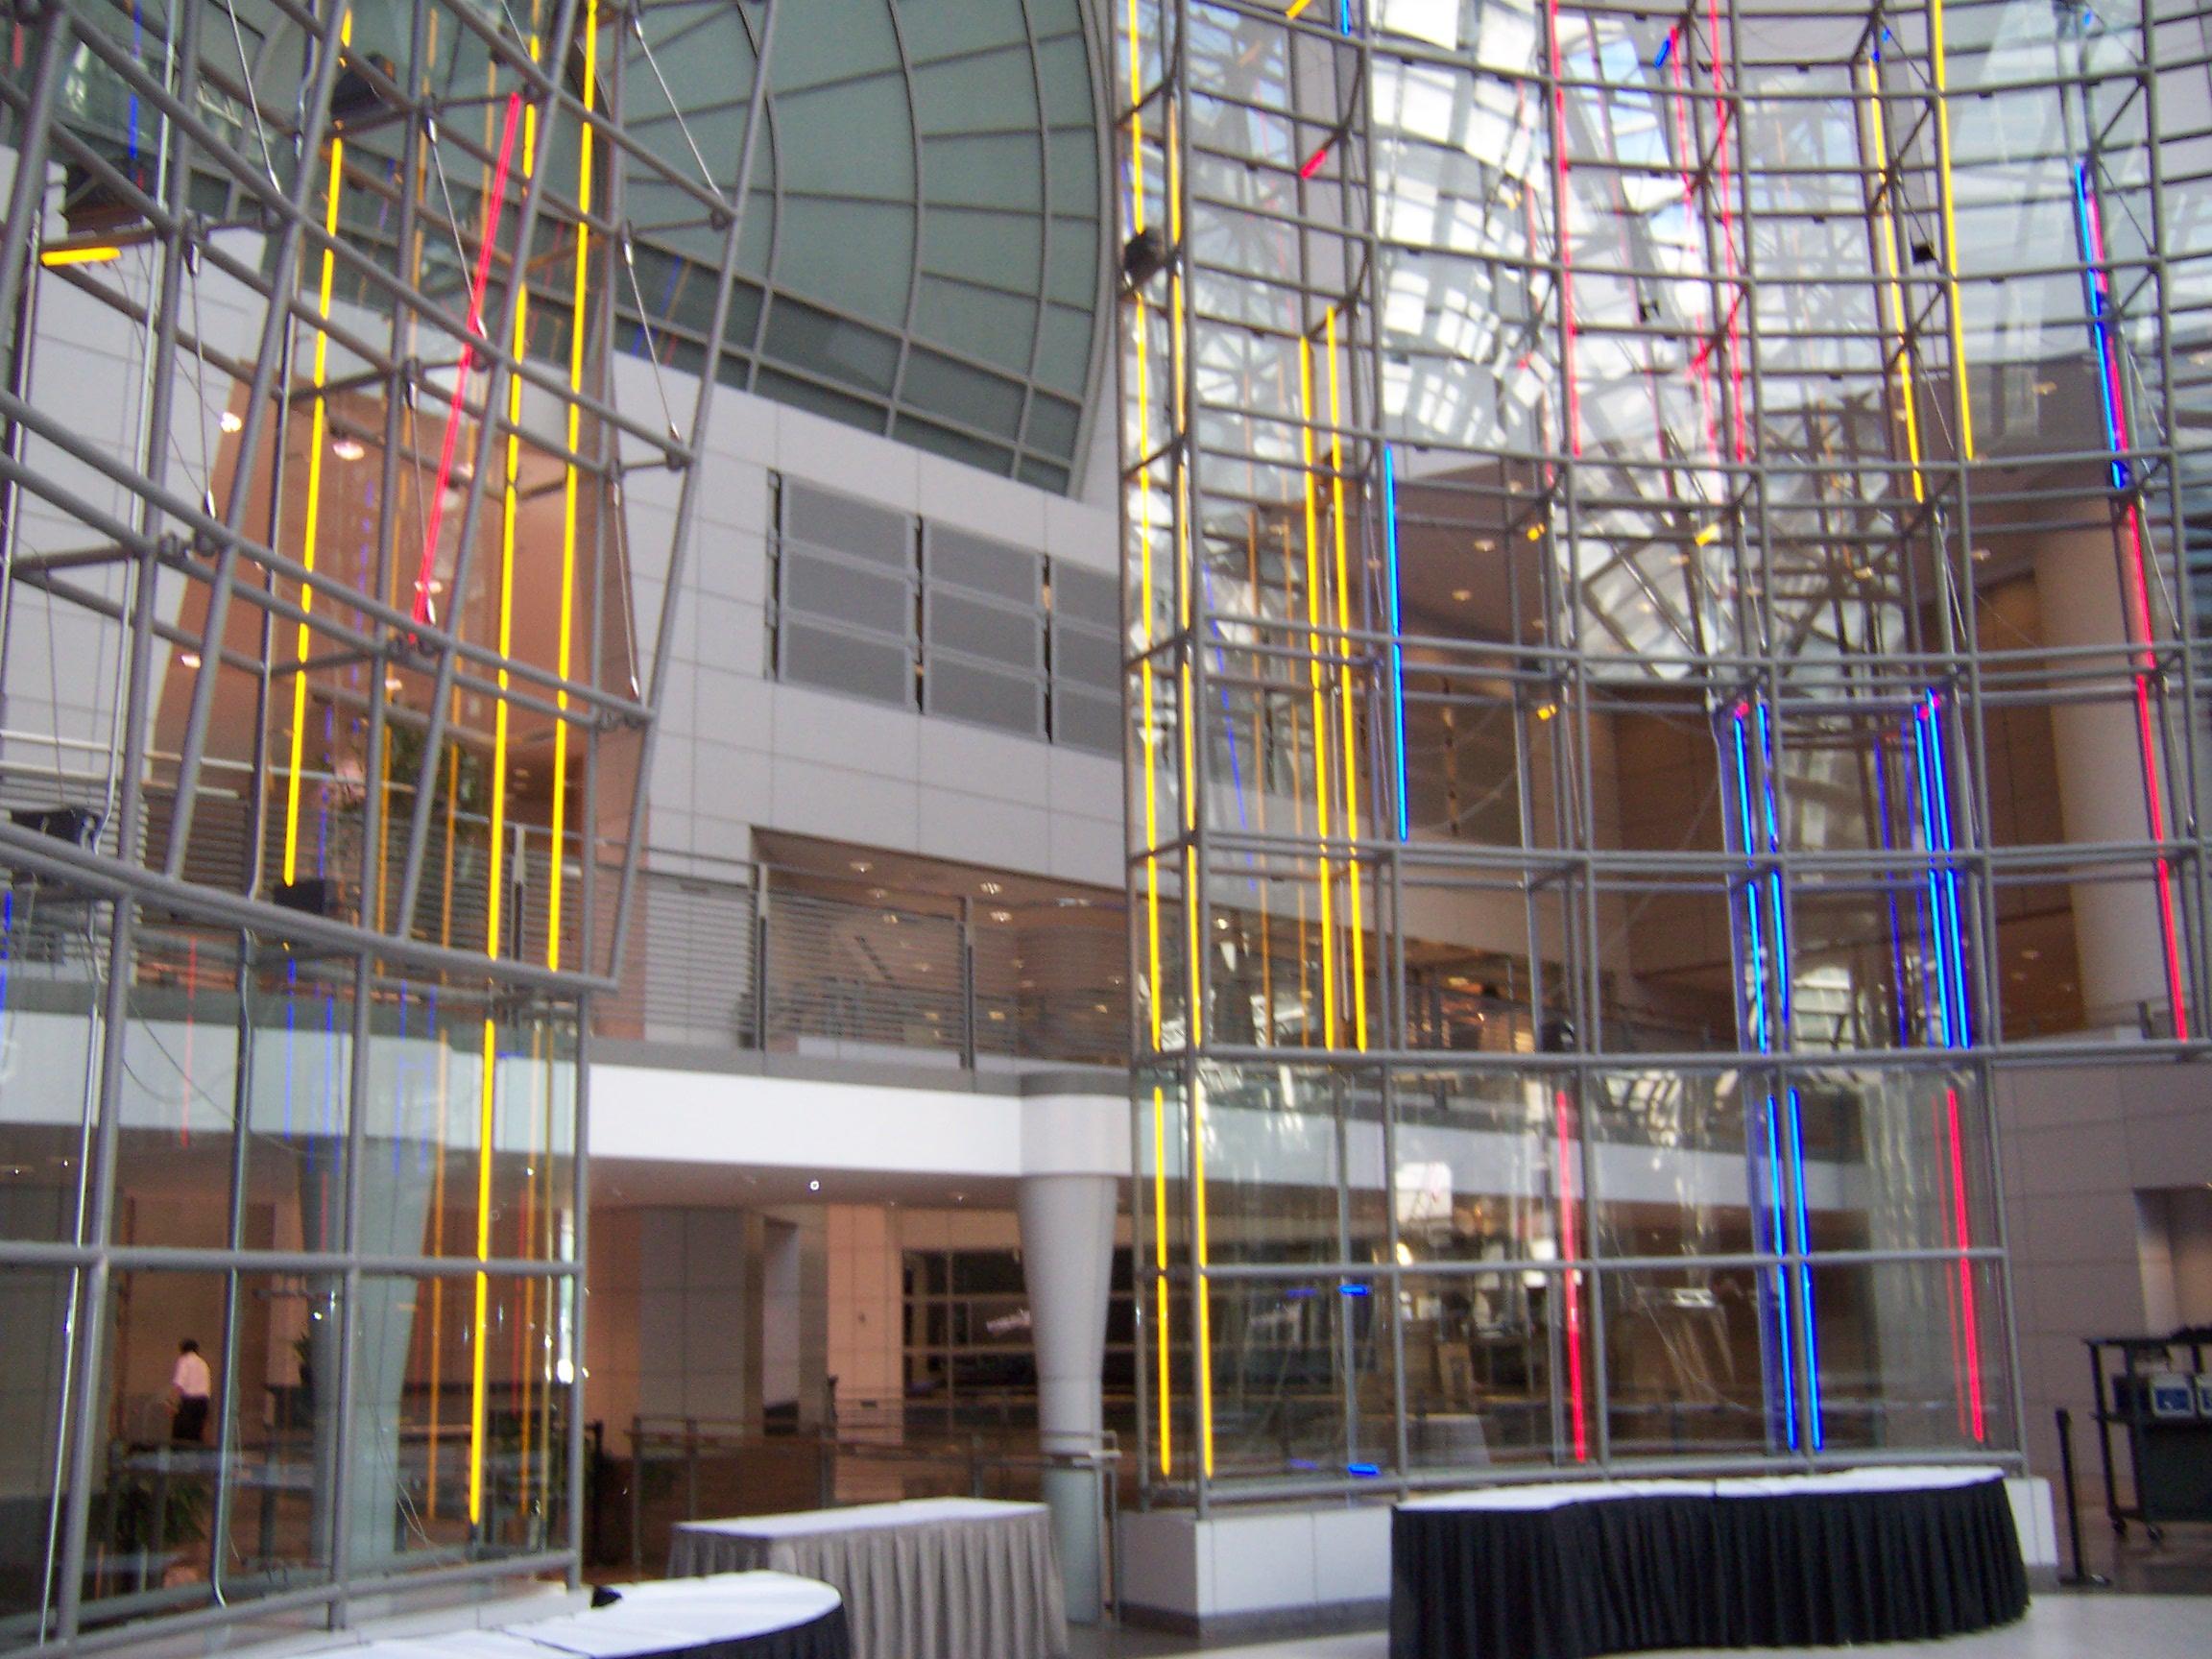 File:ronald Reagan Building